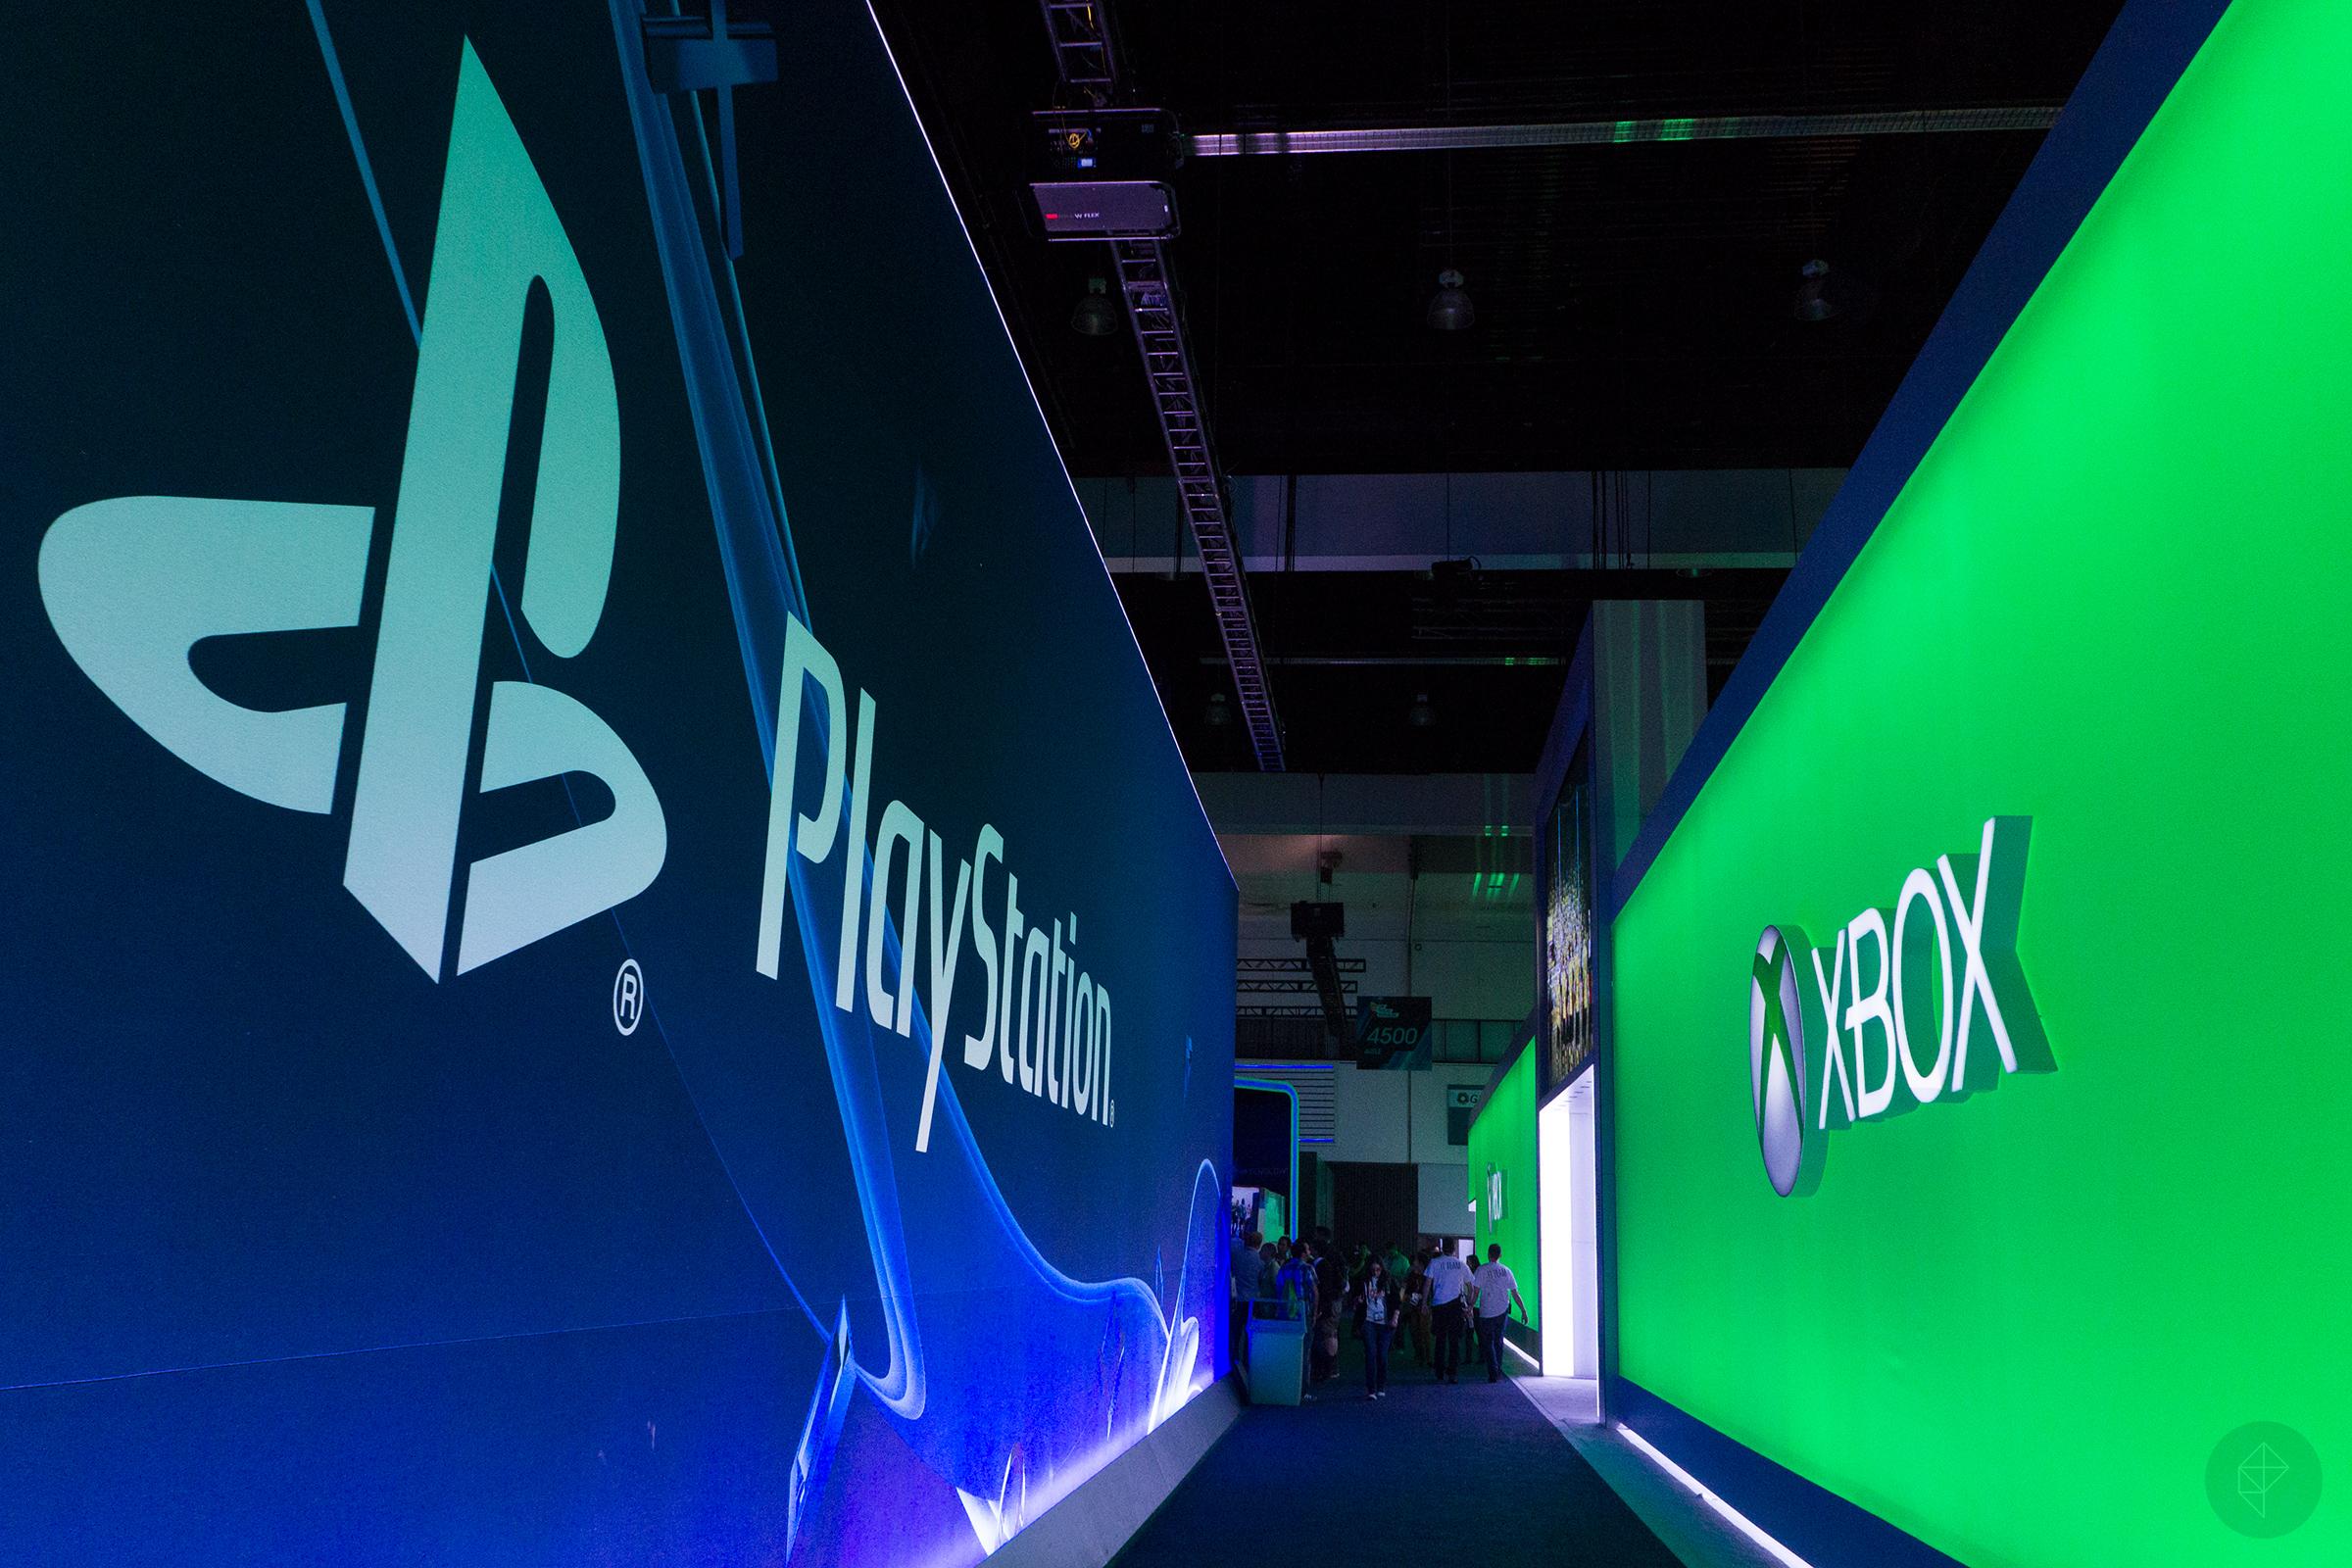 E3 2017: schedule and press conference live streams